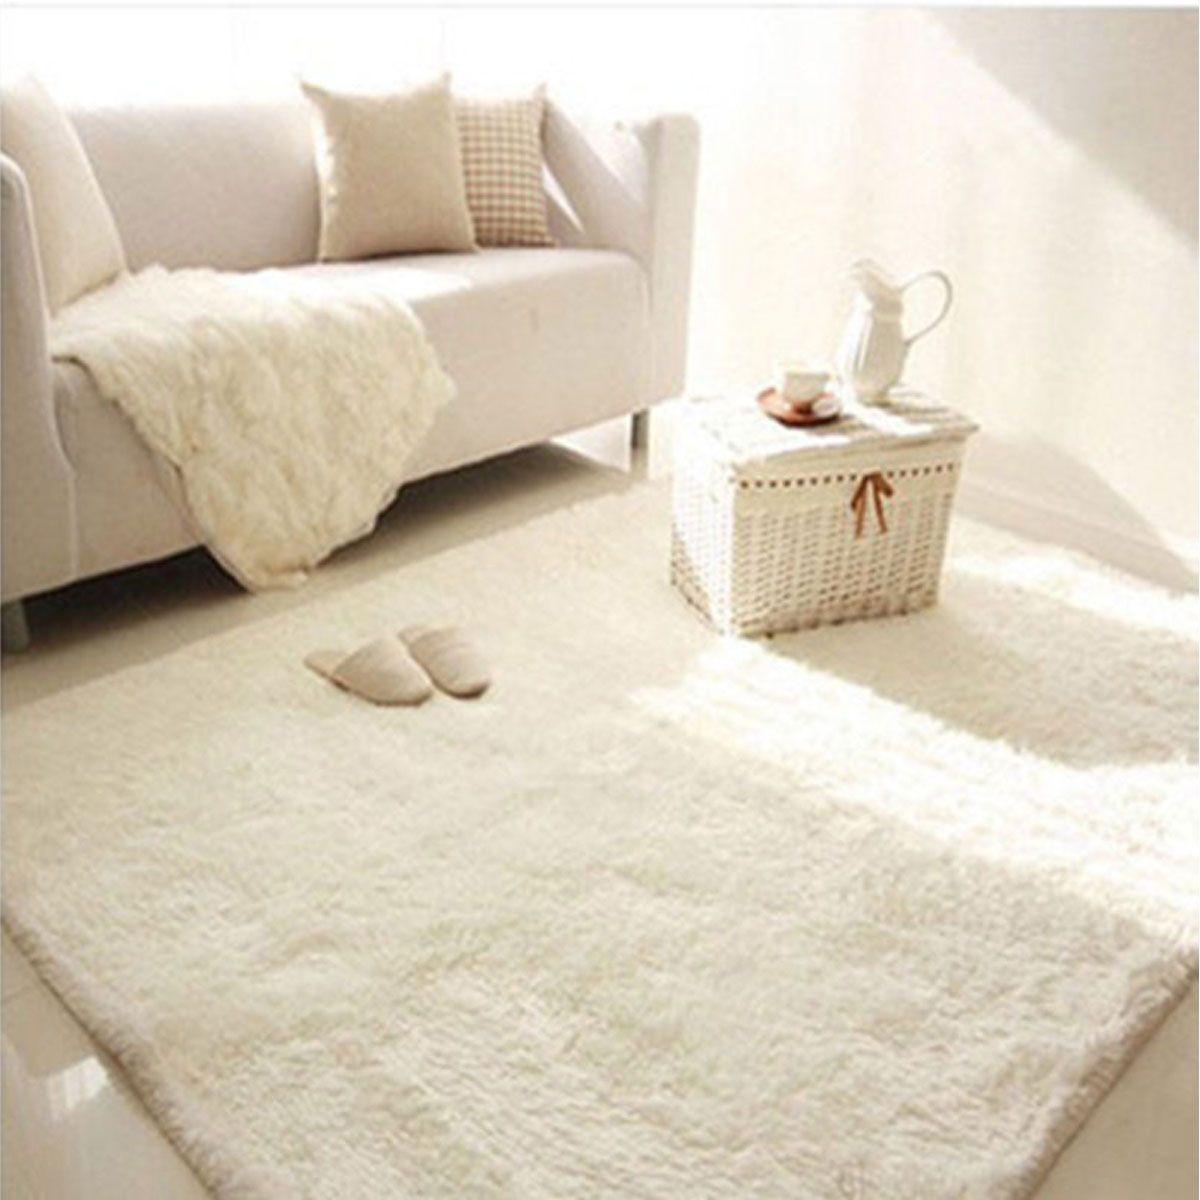 Soft Fluffy Floor Rug Anti Skid Shag Shaggy Area Rug Bedroom Dining Room Carpet Yoga Mat Child Play Mat Walmart Com In 2020 Buying Carpet Room Carpet Textured Carpet